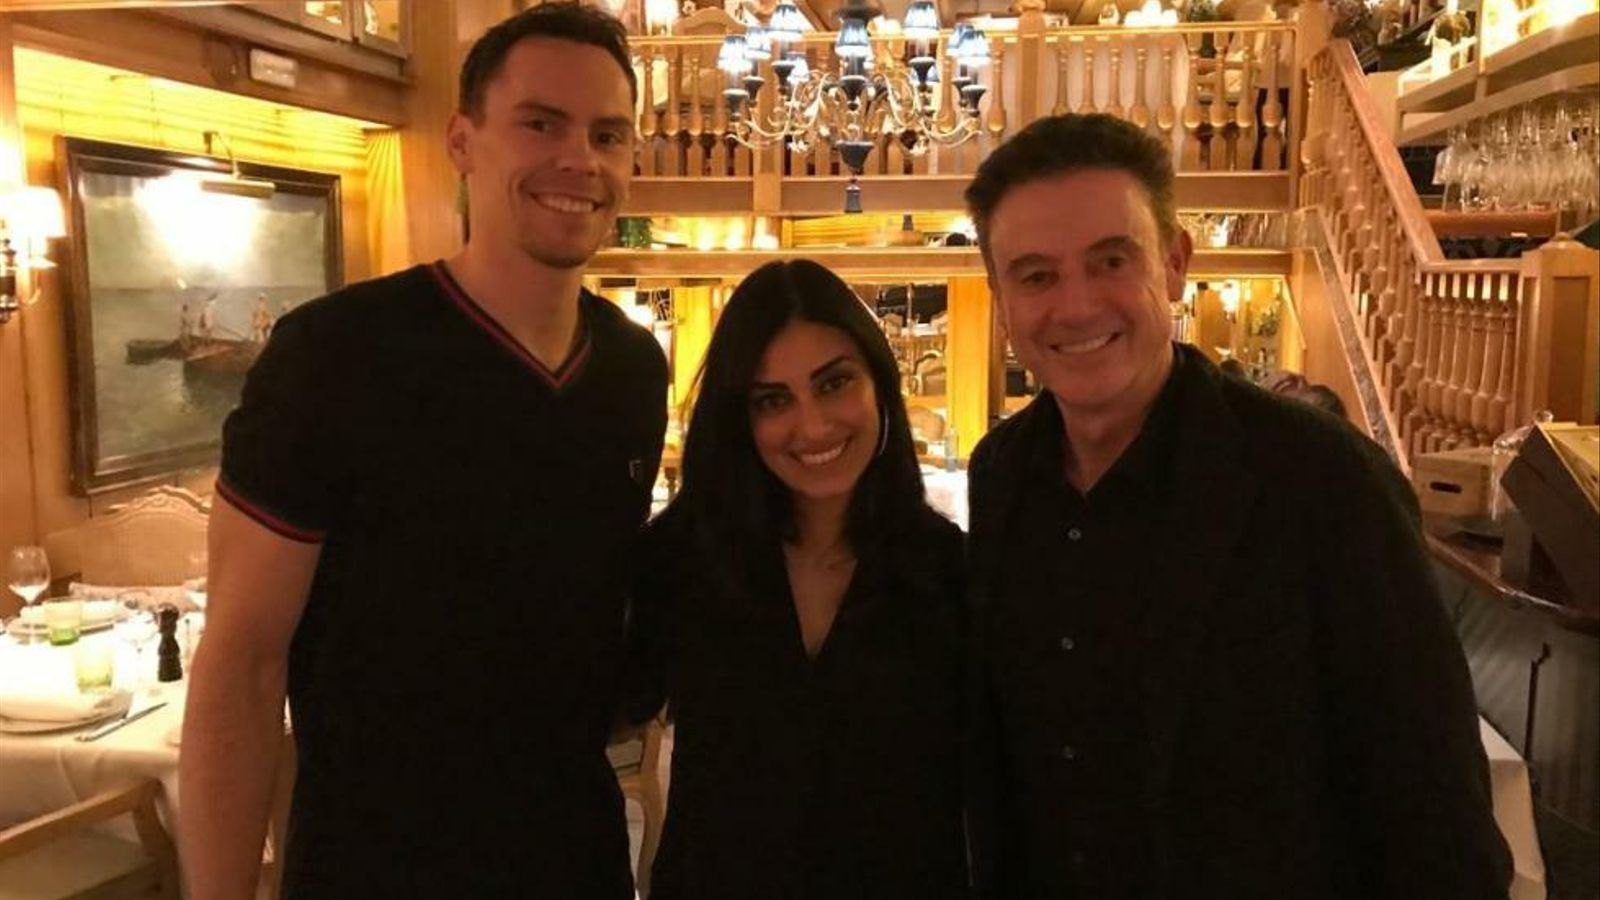 Kyle Kuric, Taraneh i Rick Pitino, a Barcelona